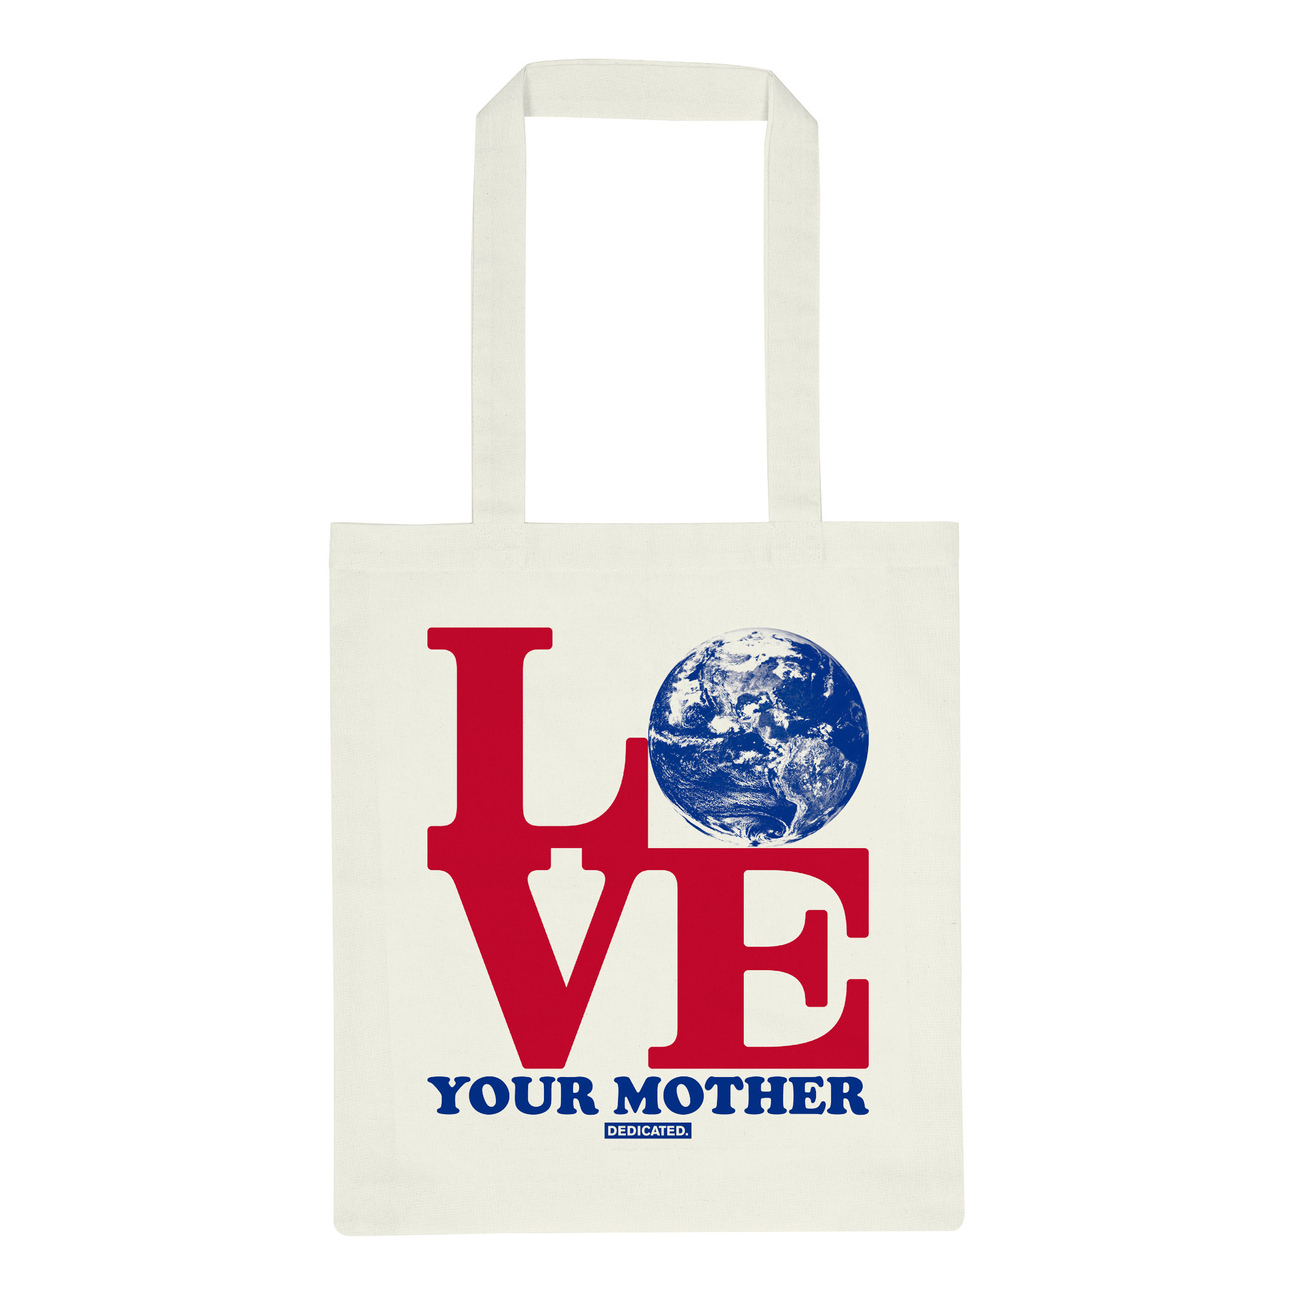 Tote Bag Torekov Love Mother